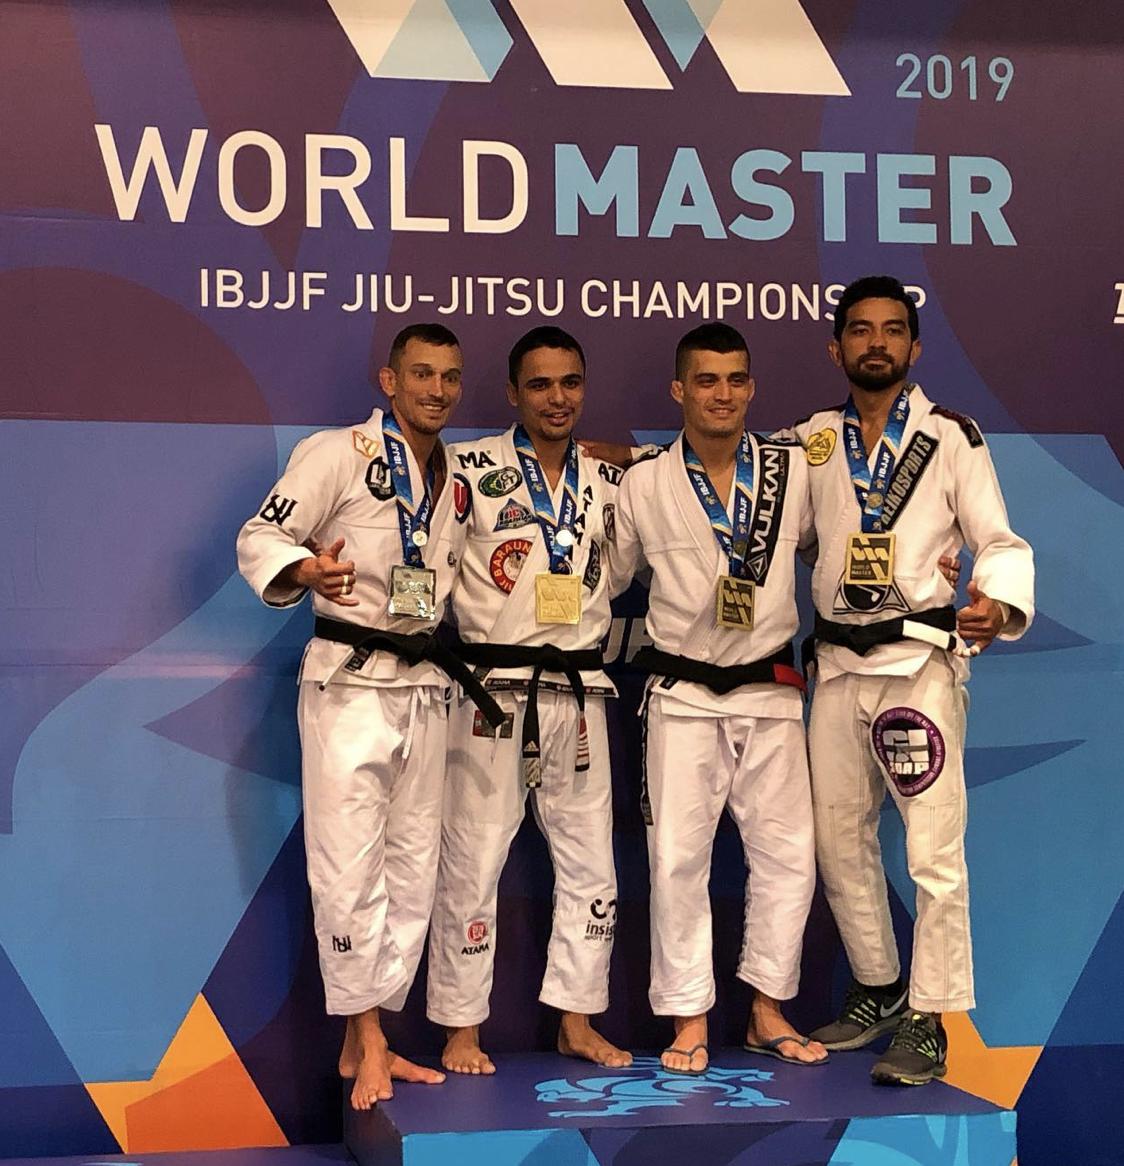 World Master 2019